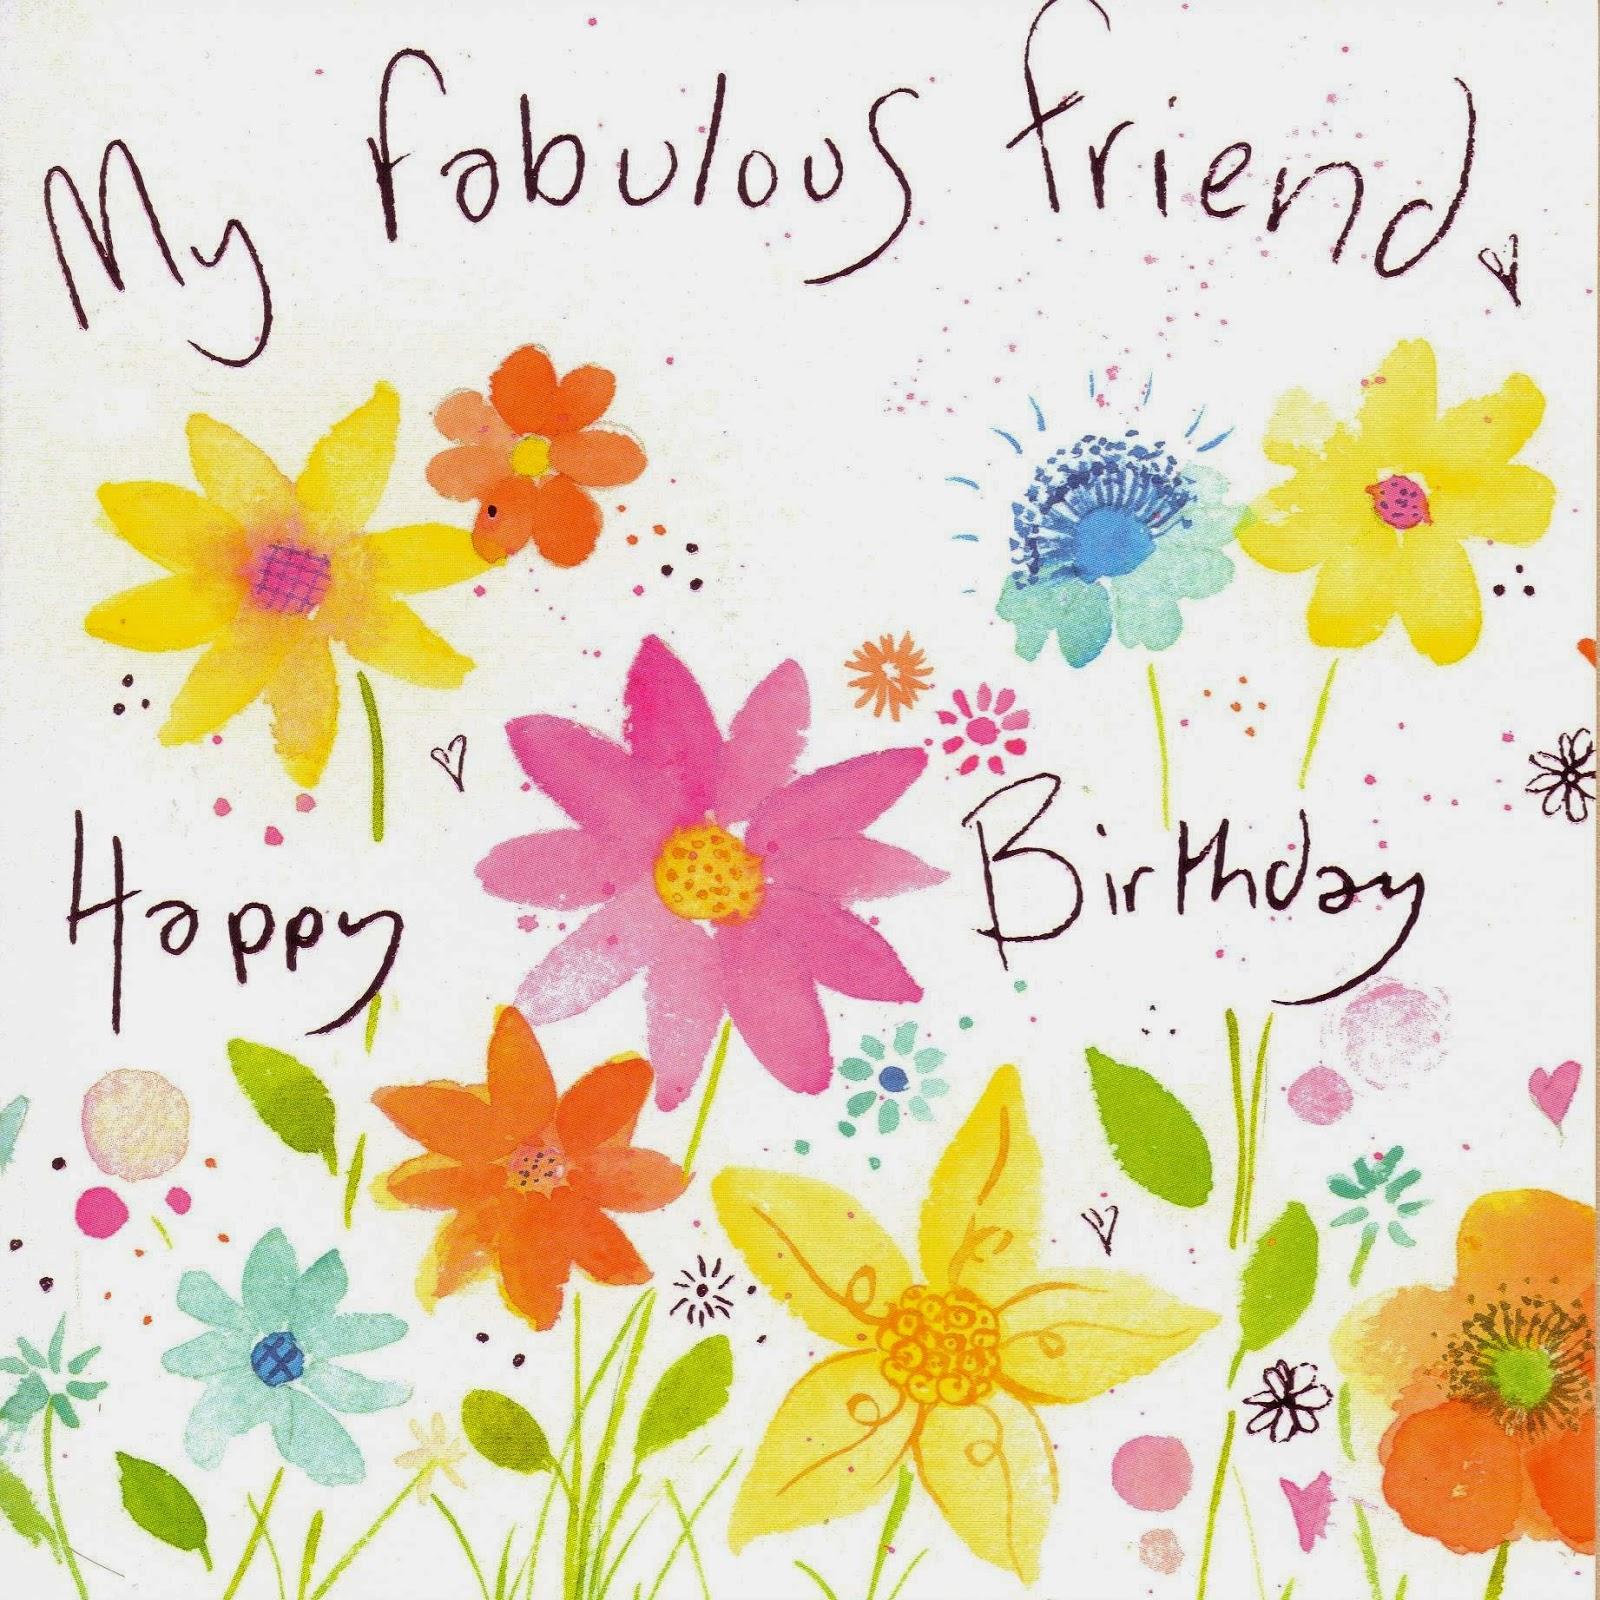 ImagesList.com: Happy Birthday Friend, Part 2